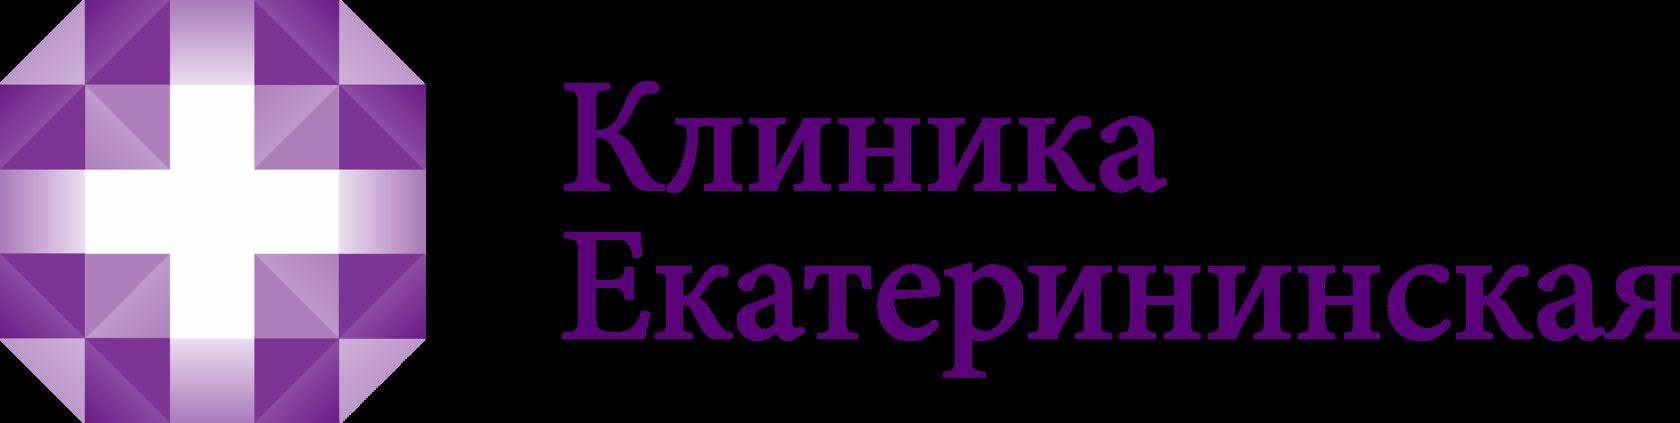 Клиника «Екатерининская» на Яцкова